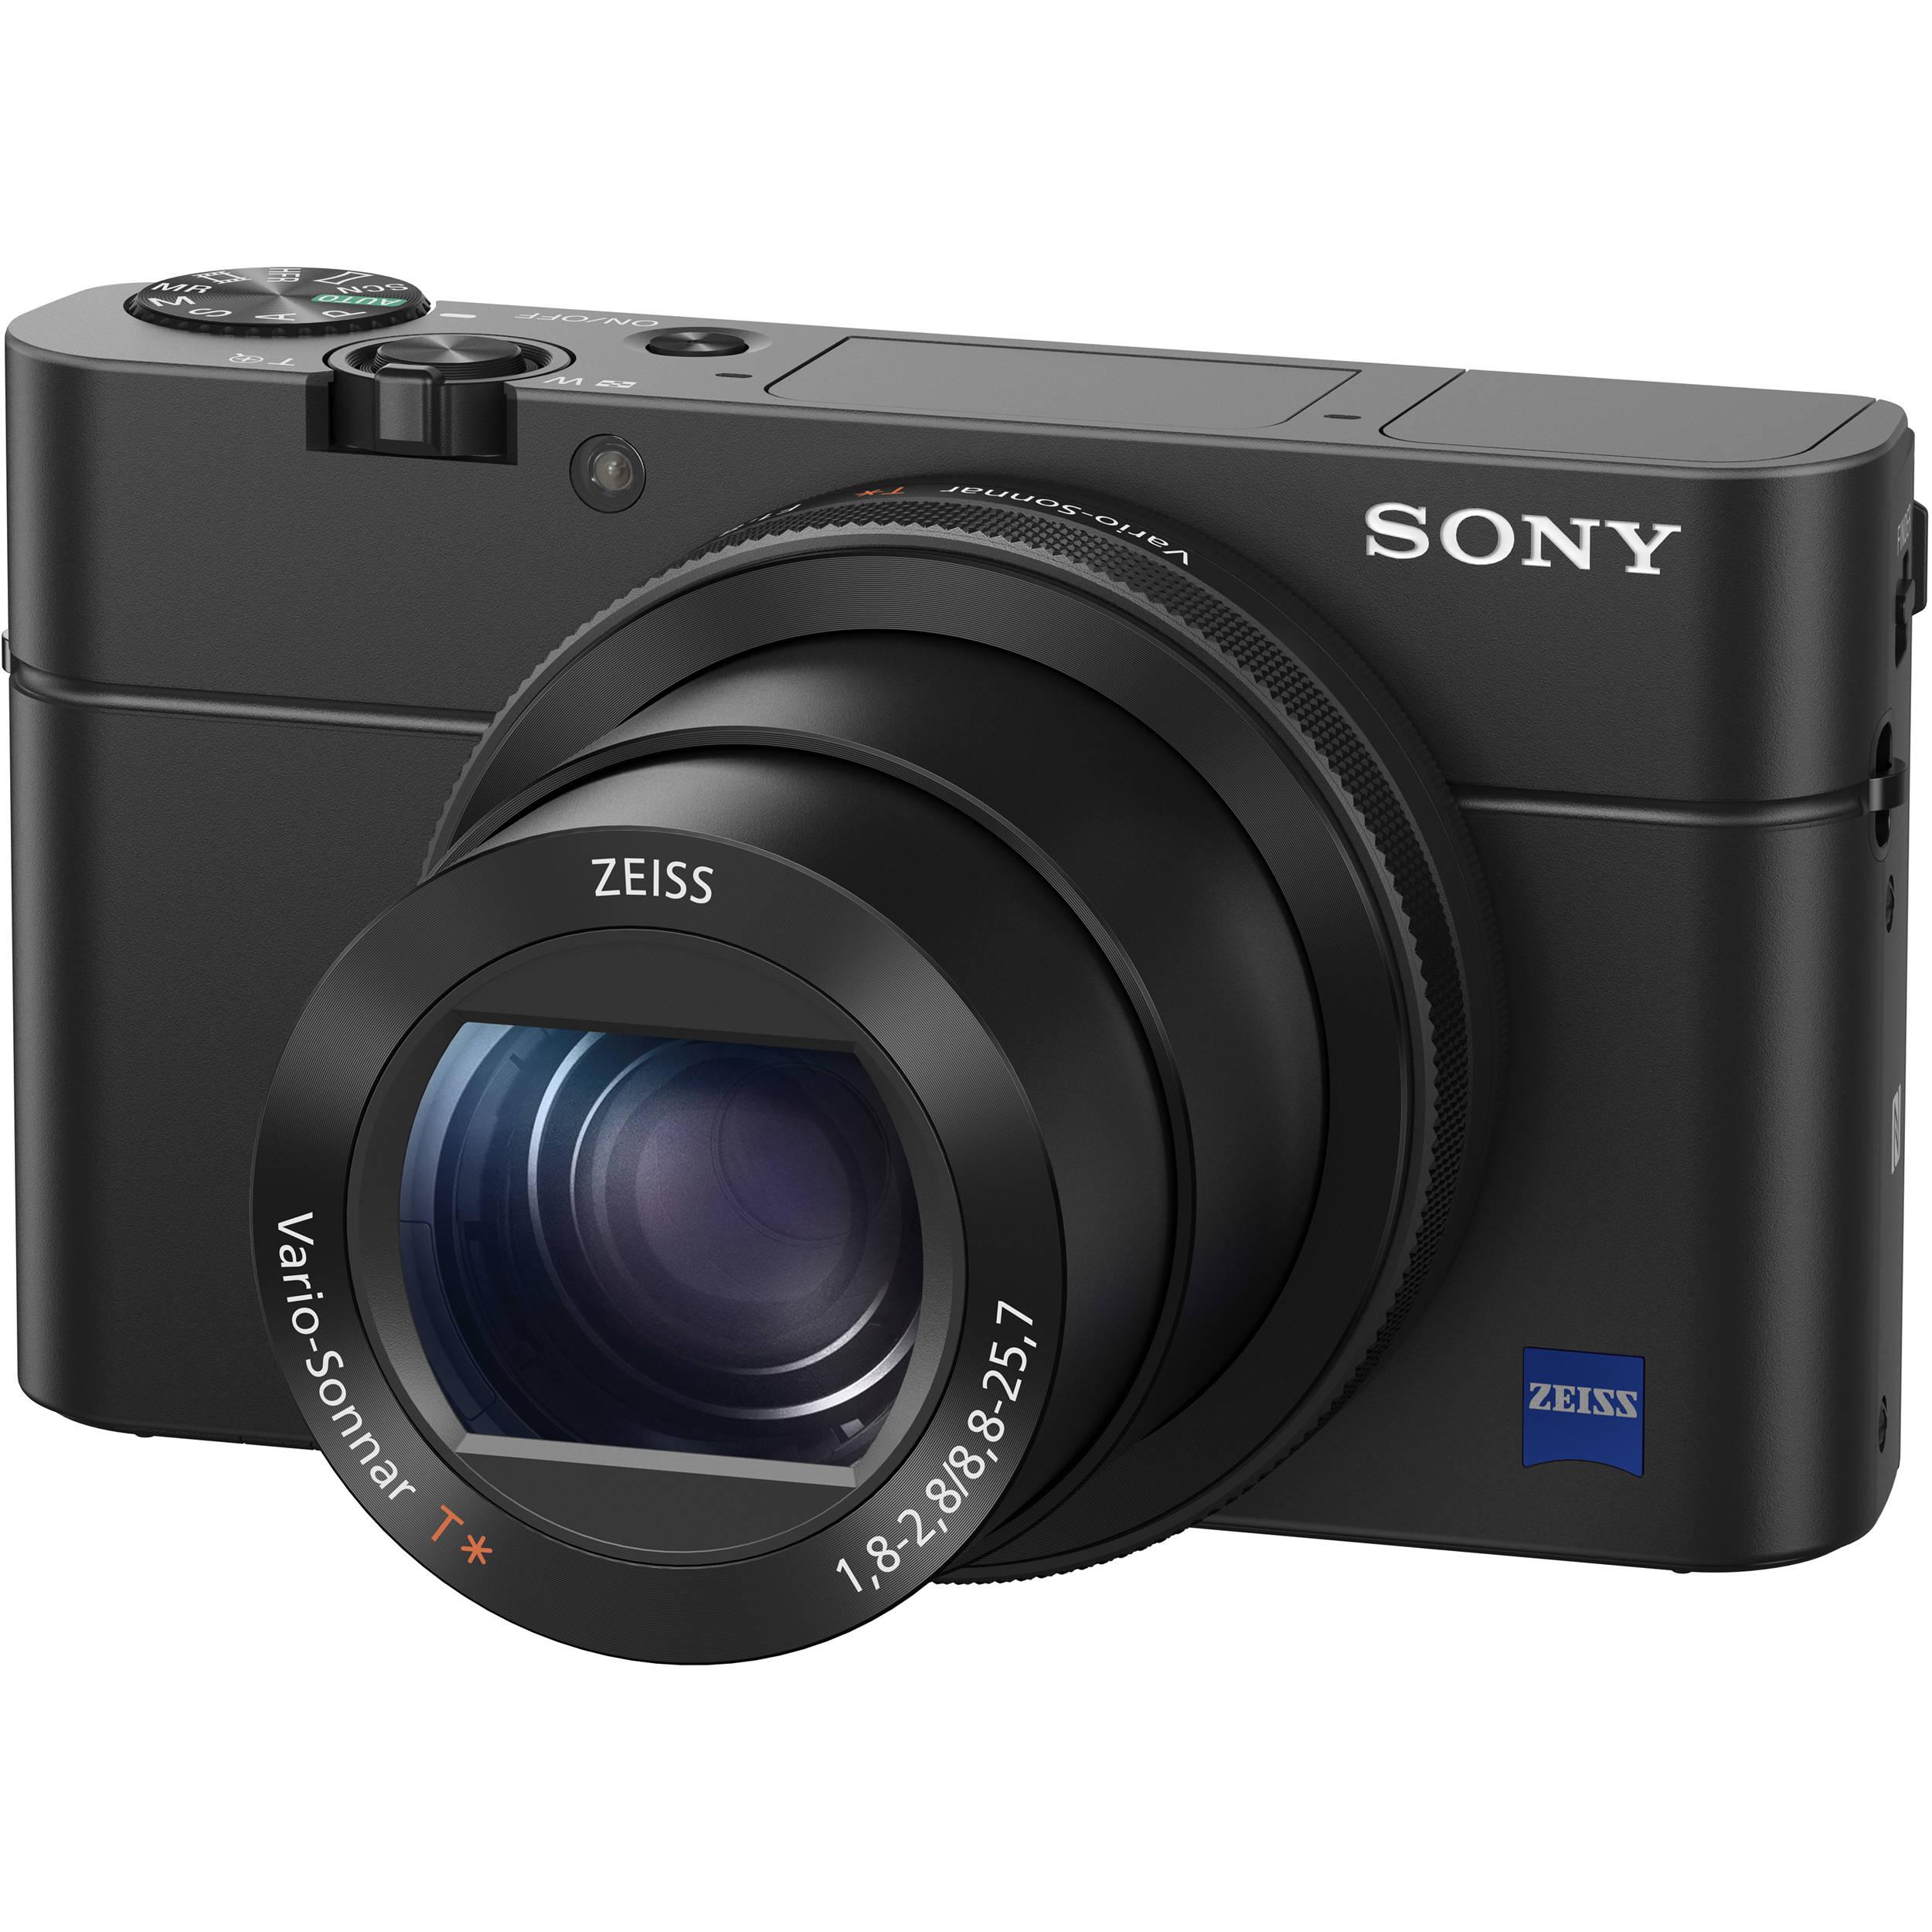 Sony Cyber-shot DSC-RX100 IV Digital Camera £439 @ Amazon